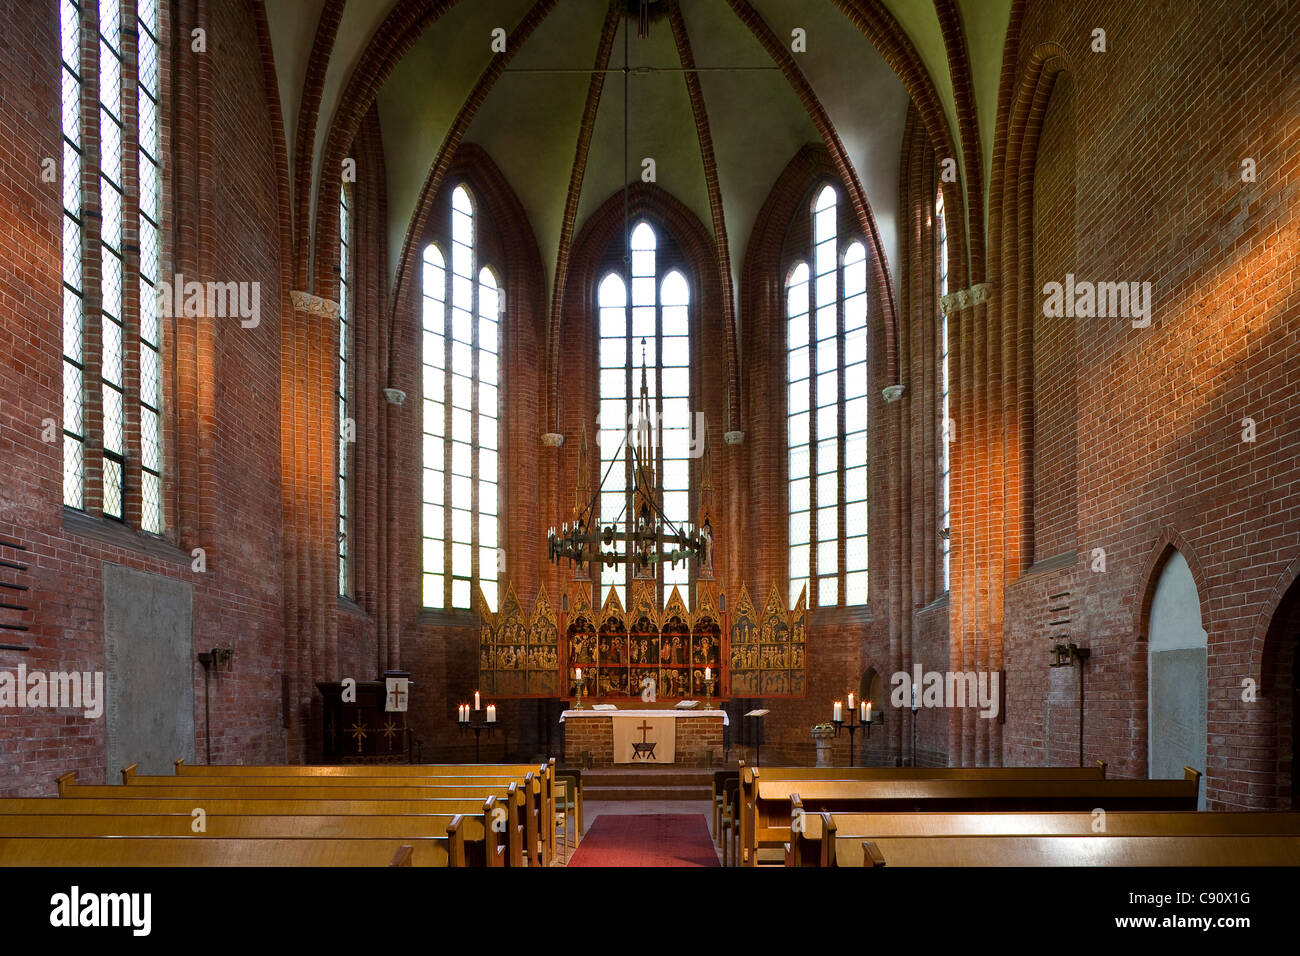 Interior view of abbey church, Cismar monastery, Cismar, Schleswig-Holstein, Germany, Europe - Stock Image